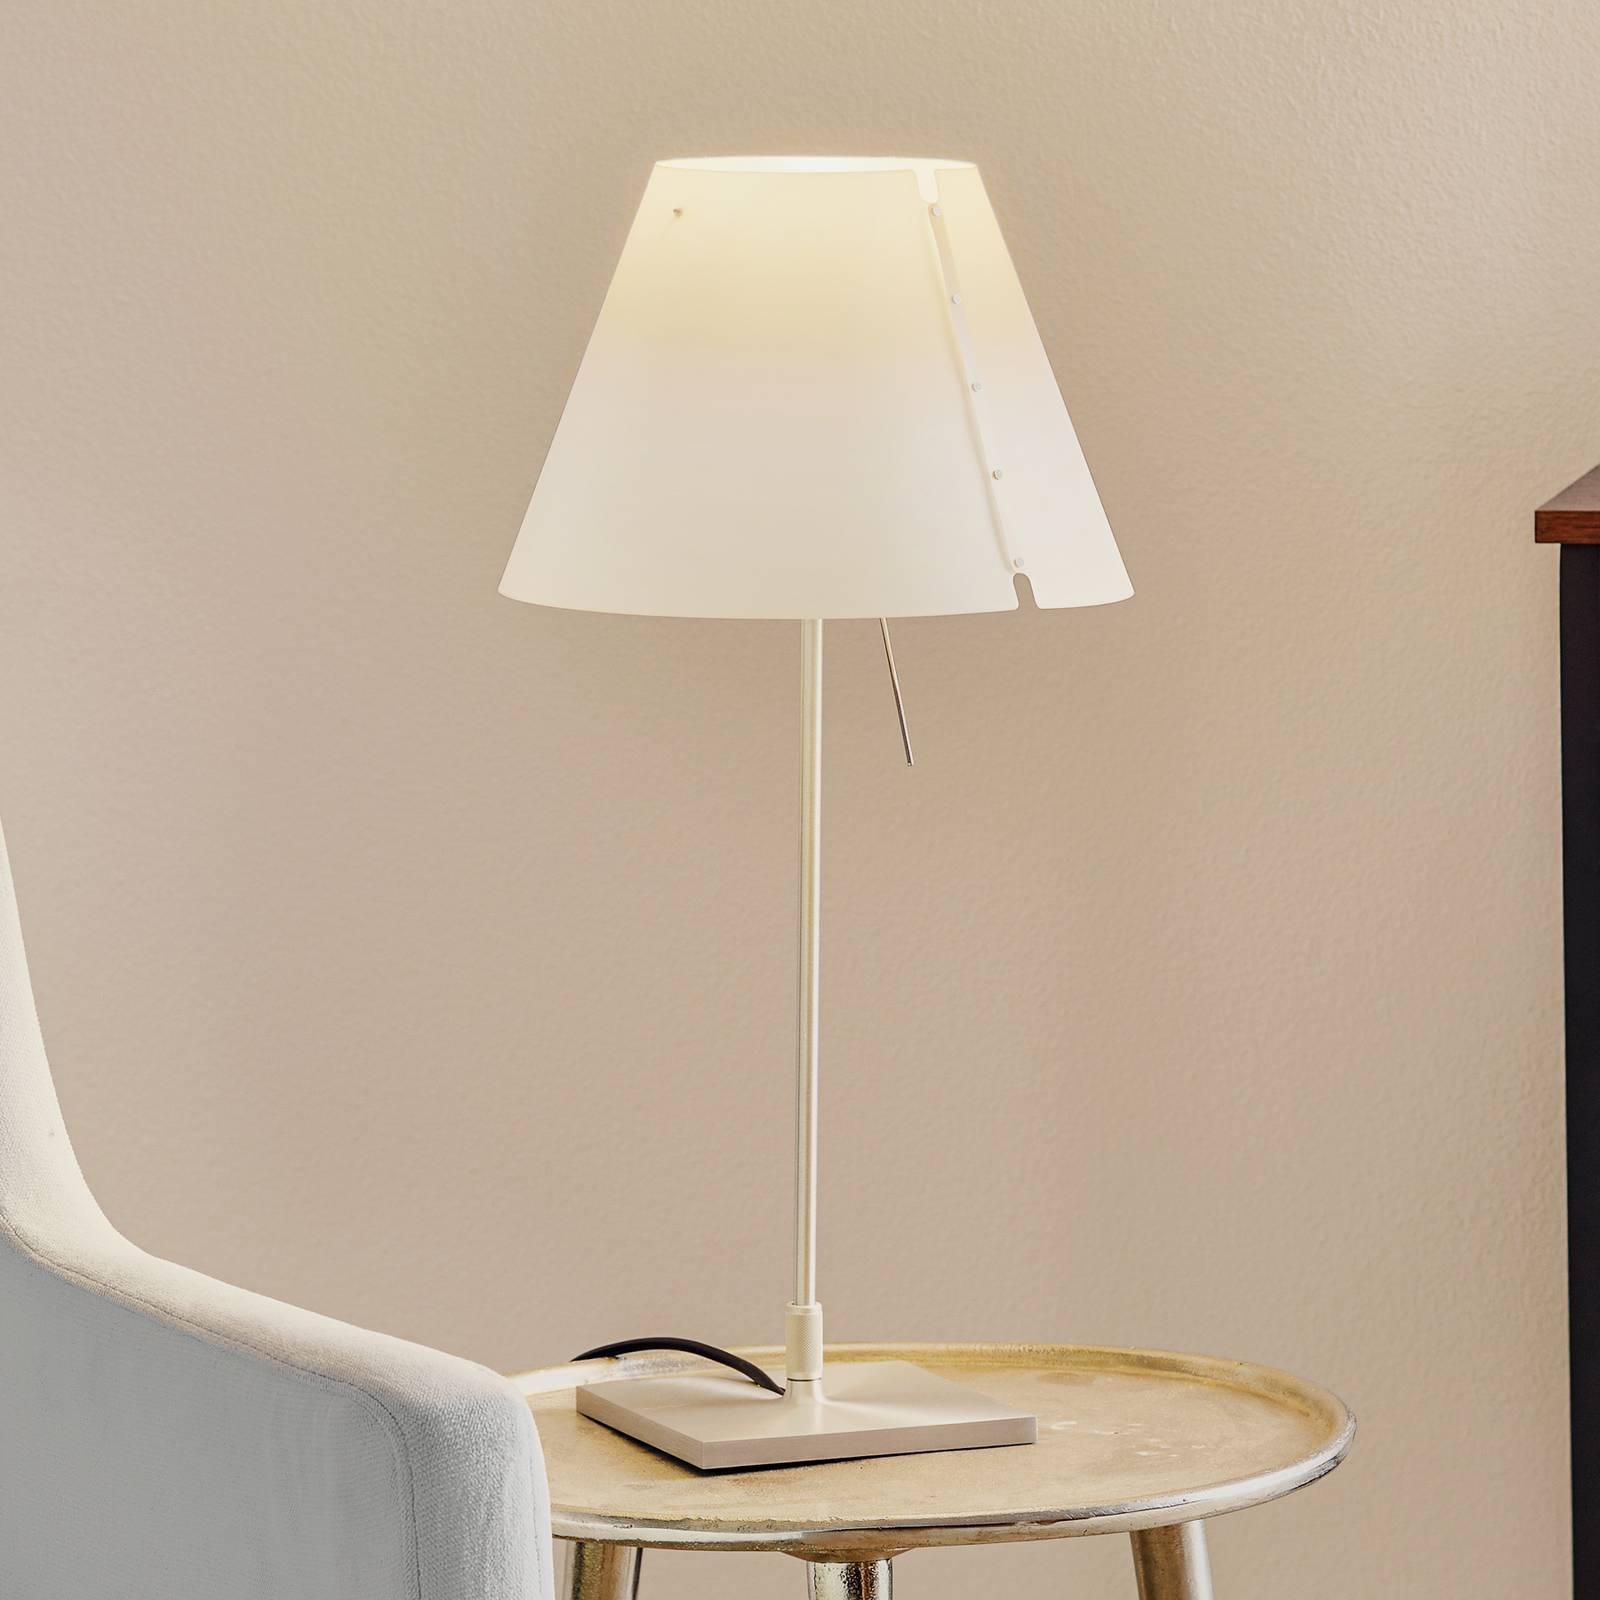 Luceplan Costanzina LED tafellamp alu wit